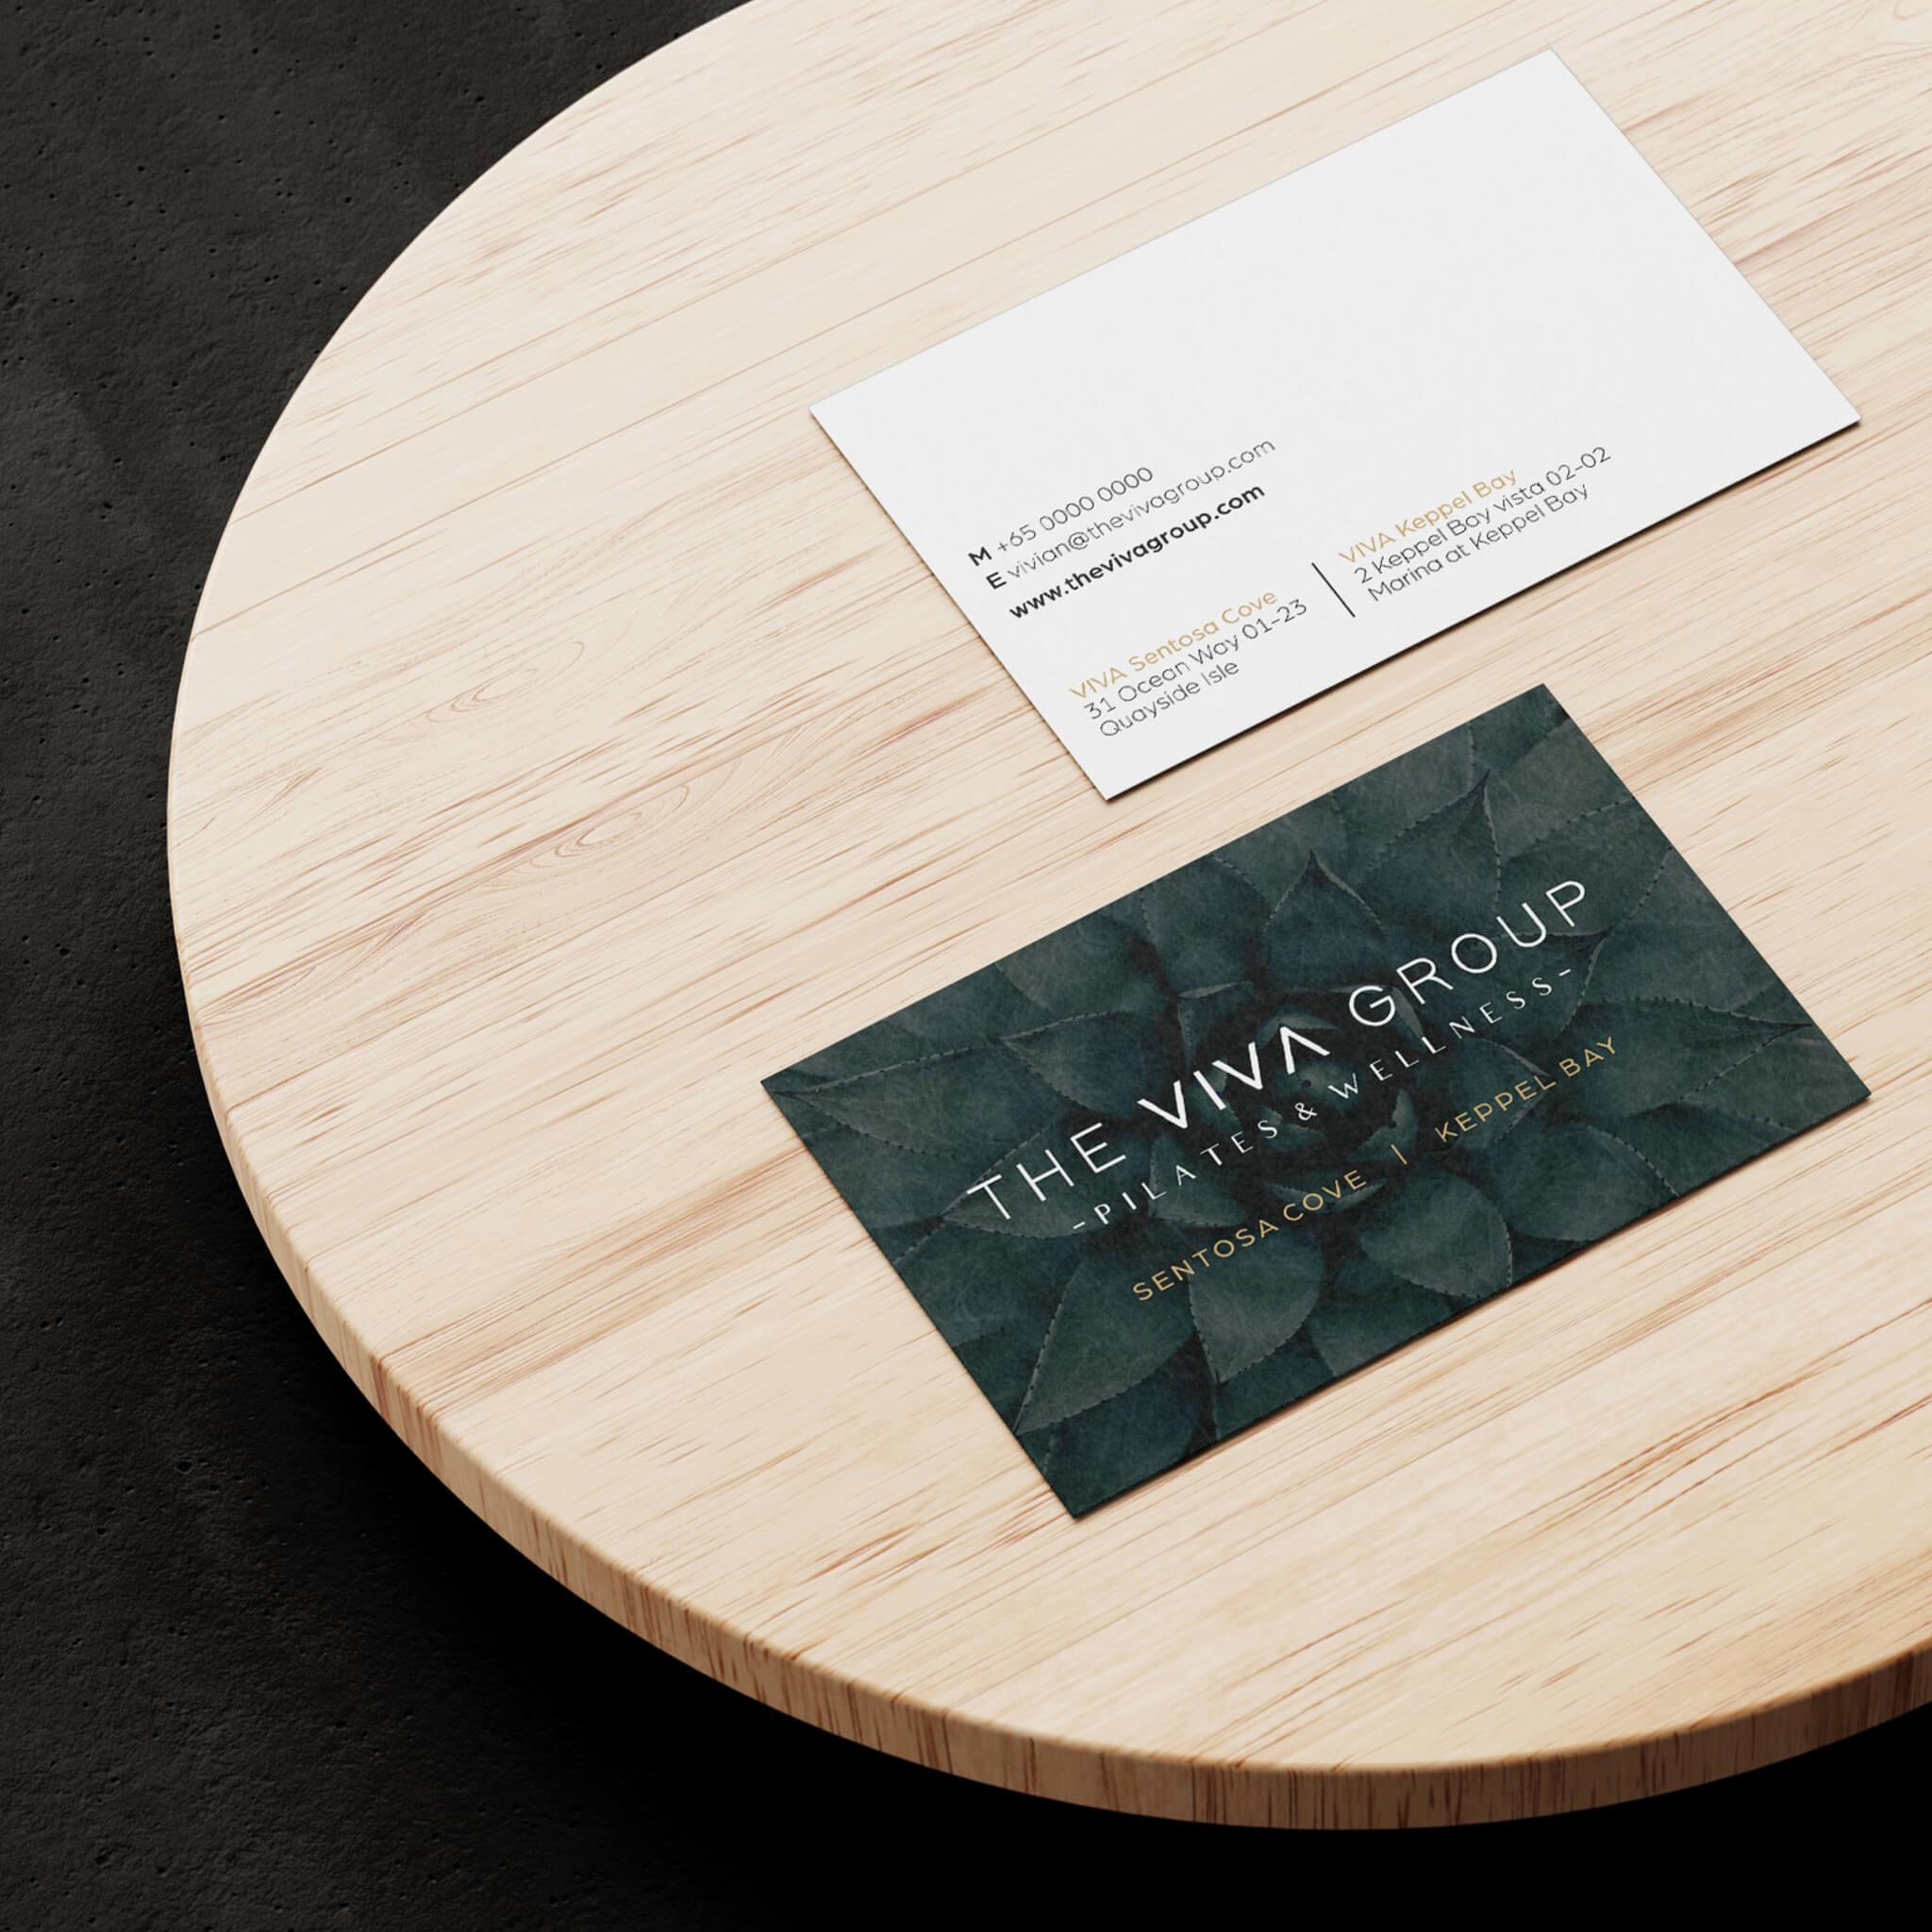 https://zanandcocreative.com.au/wp-content/uploads/2021/04/The-Viva-Group-Business-Card-Design-Branding-Design-1.jpg